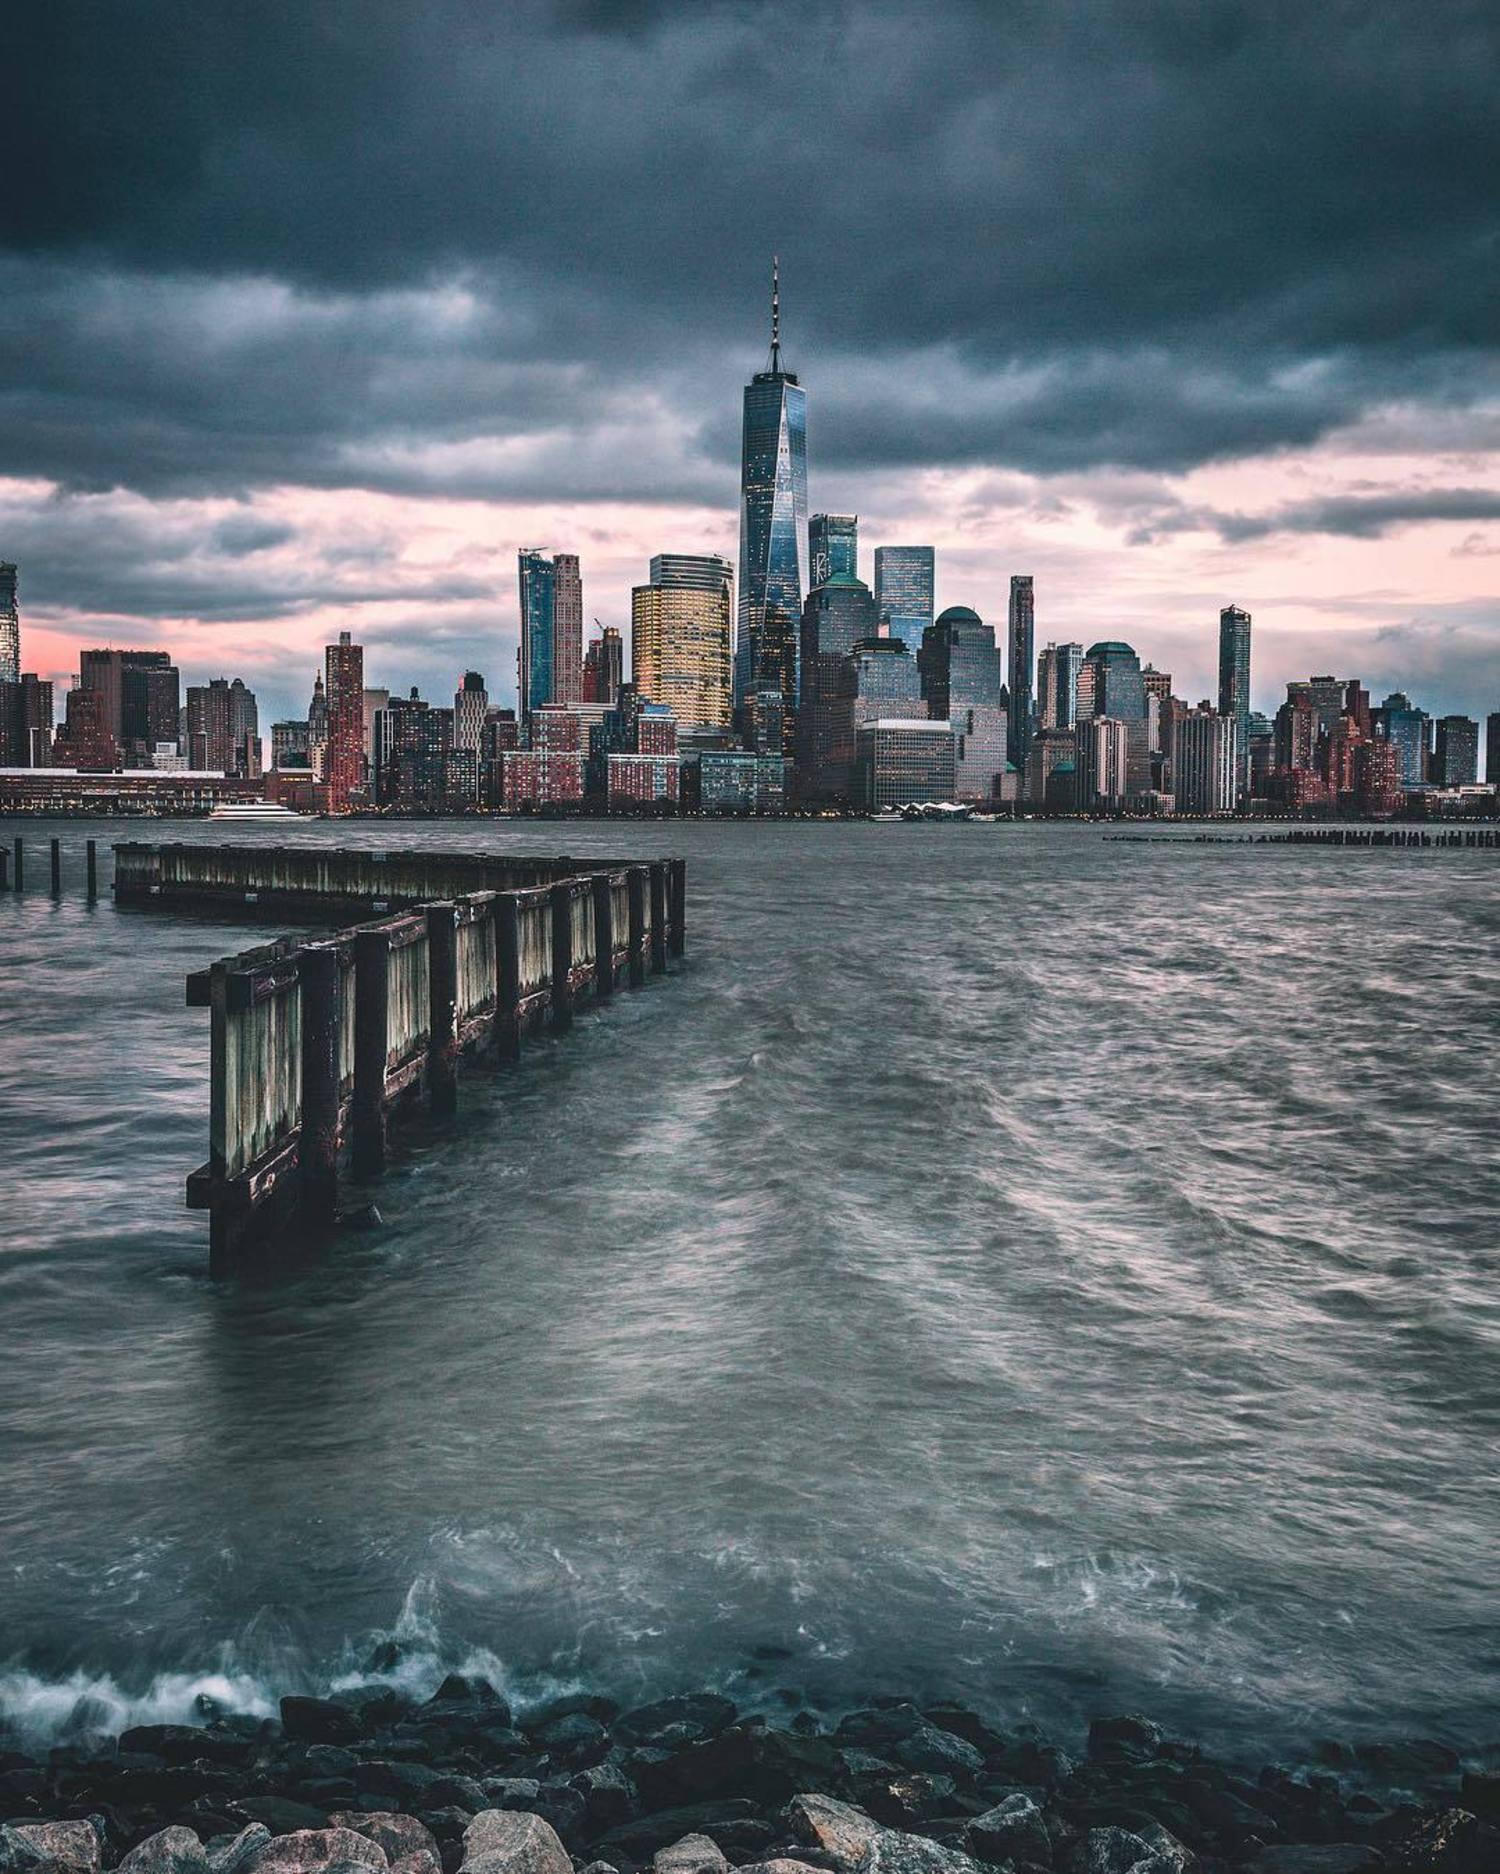 Lower Manhattan Skyline from Jersey City, New Jersey